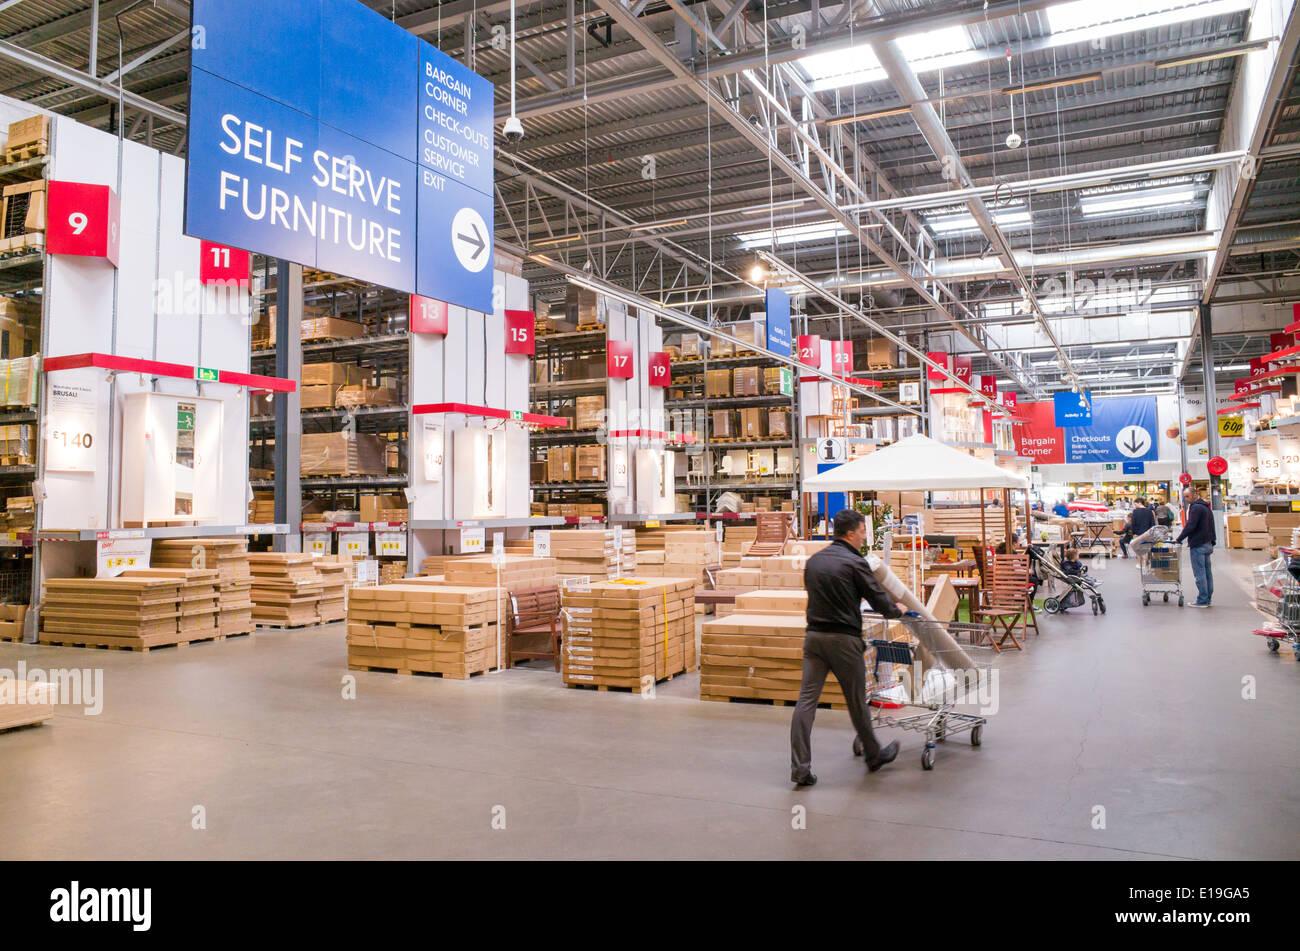 Warehouse Area Of Ikea Furniture Store England UK Stock